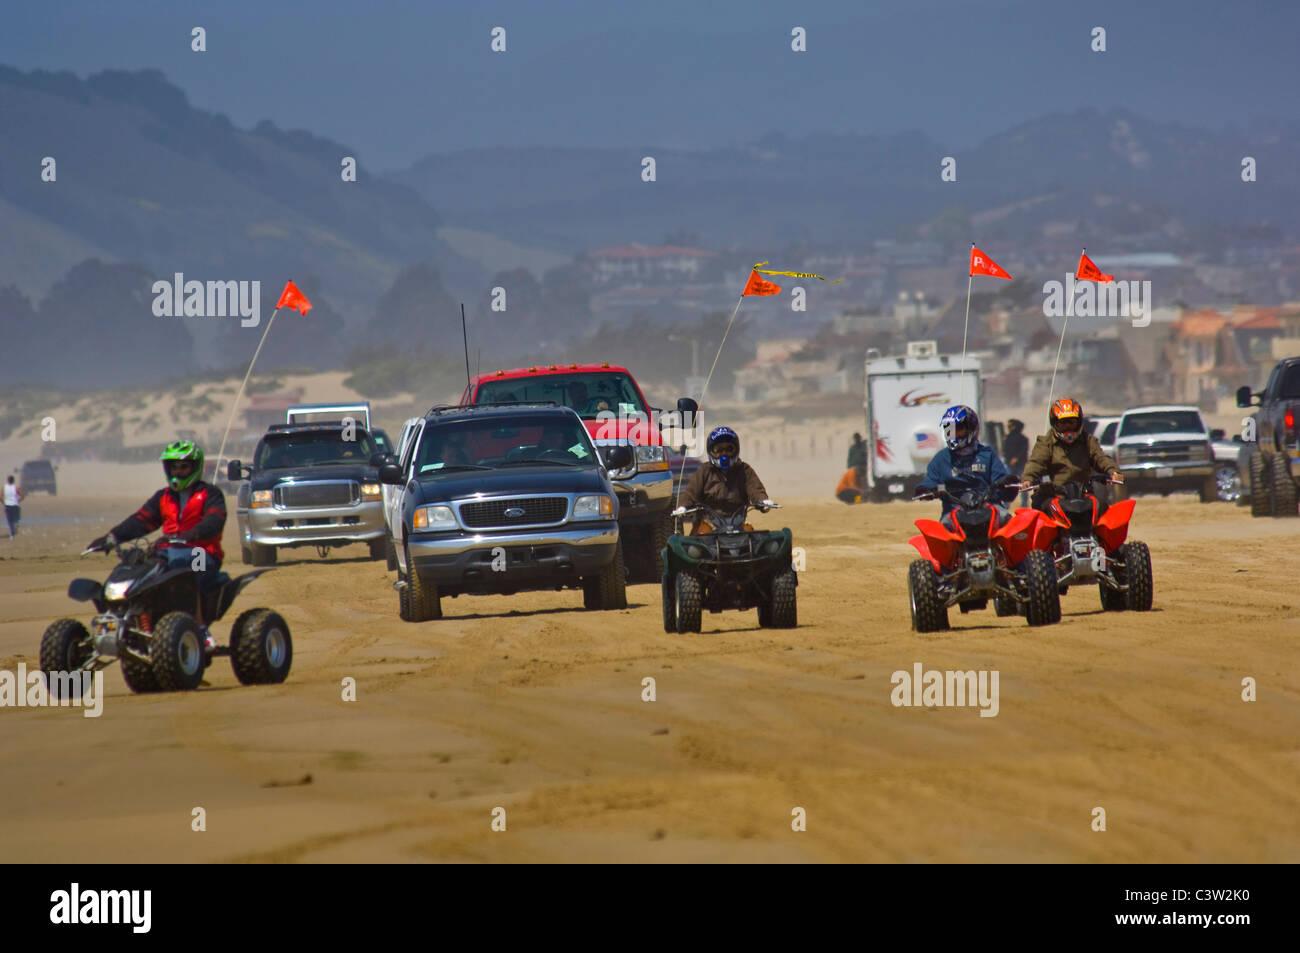 ATV e veicoli passeggeri guida su sabbia al Oceano Dunes State Vehicular Recreation Area, Oceano, California Immagini Stock